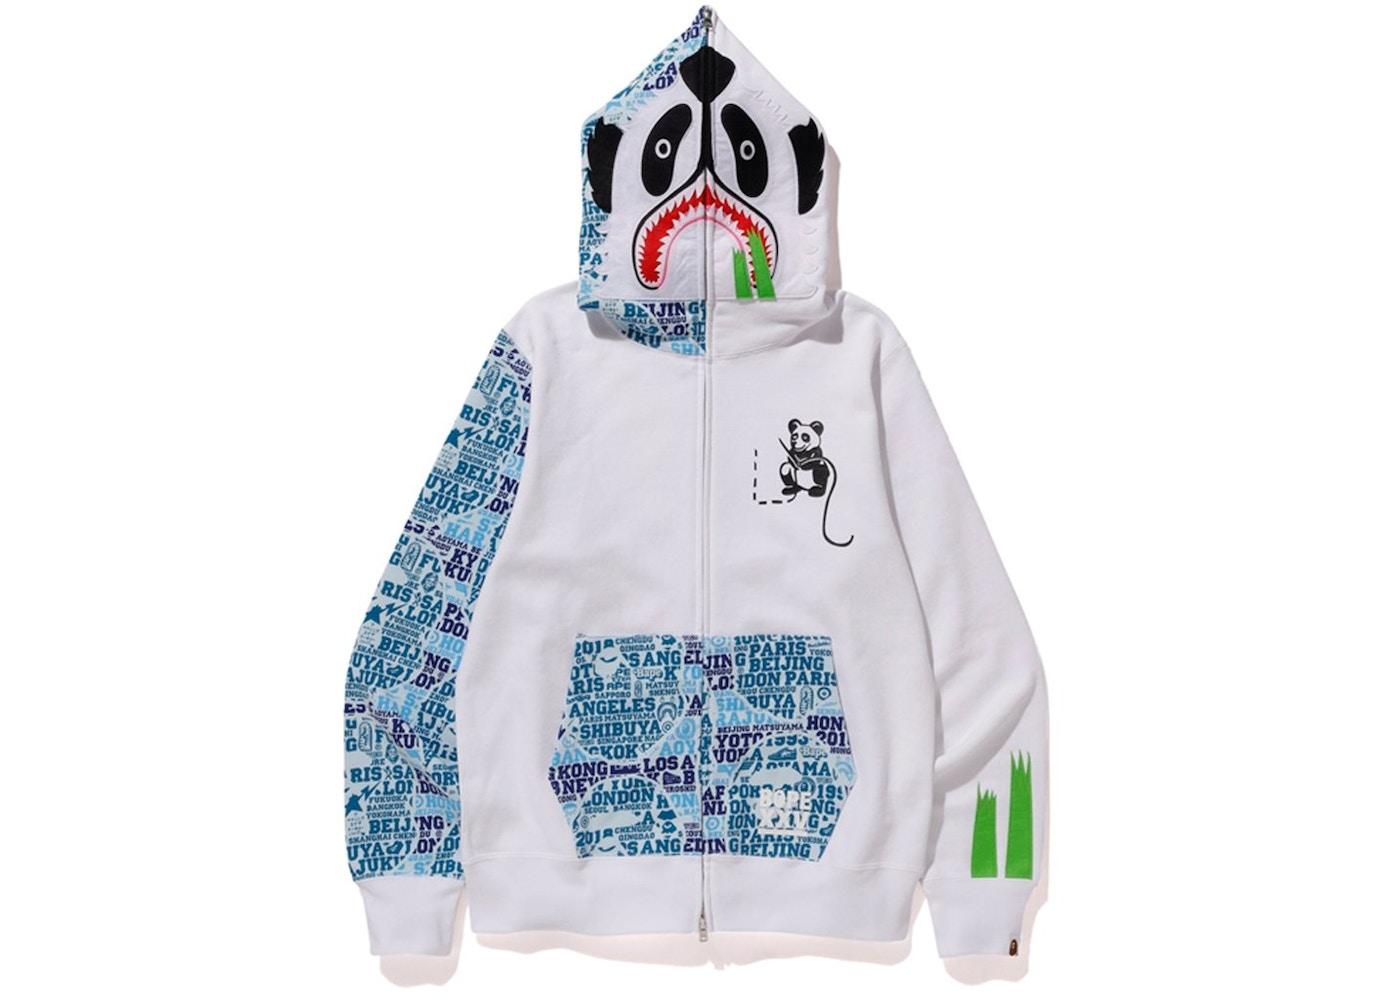 f34517e0 Streetwear - Bape Tops/Sweatshirts - New Highest Bids